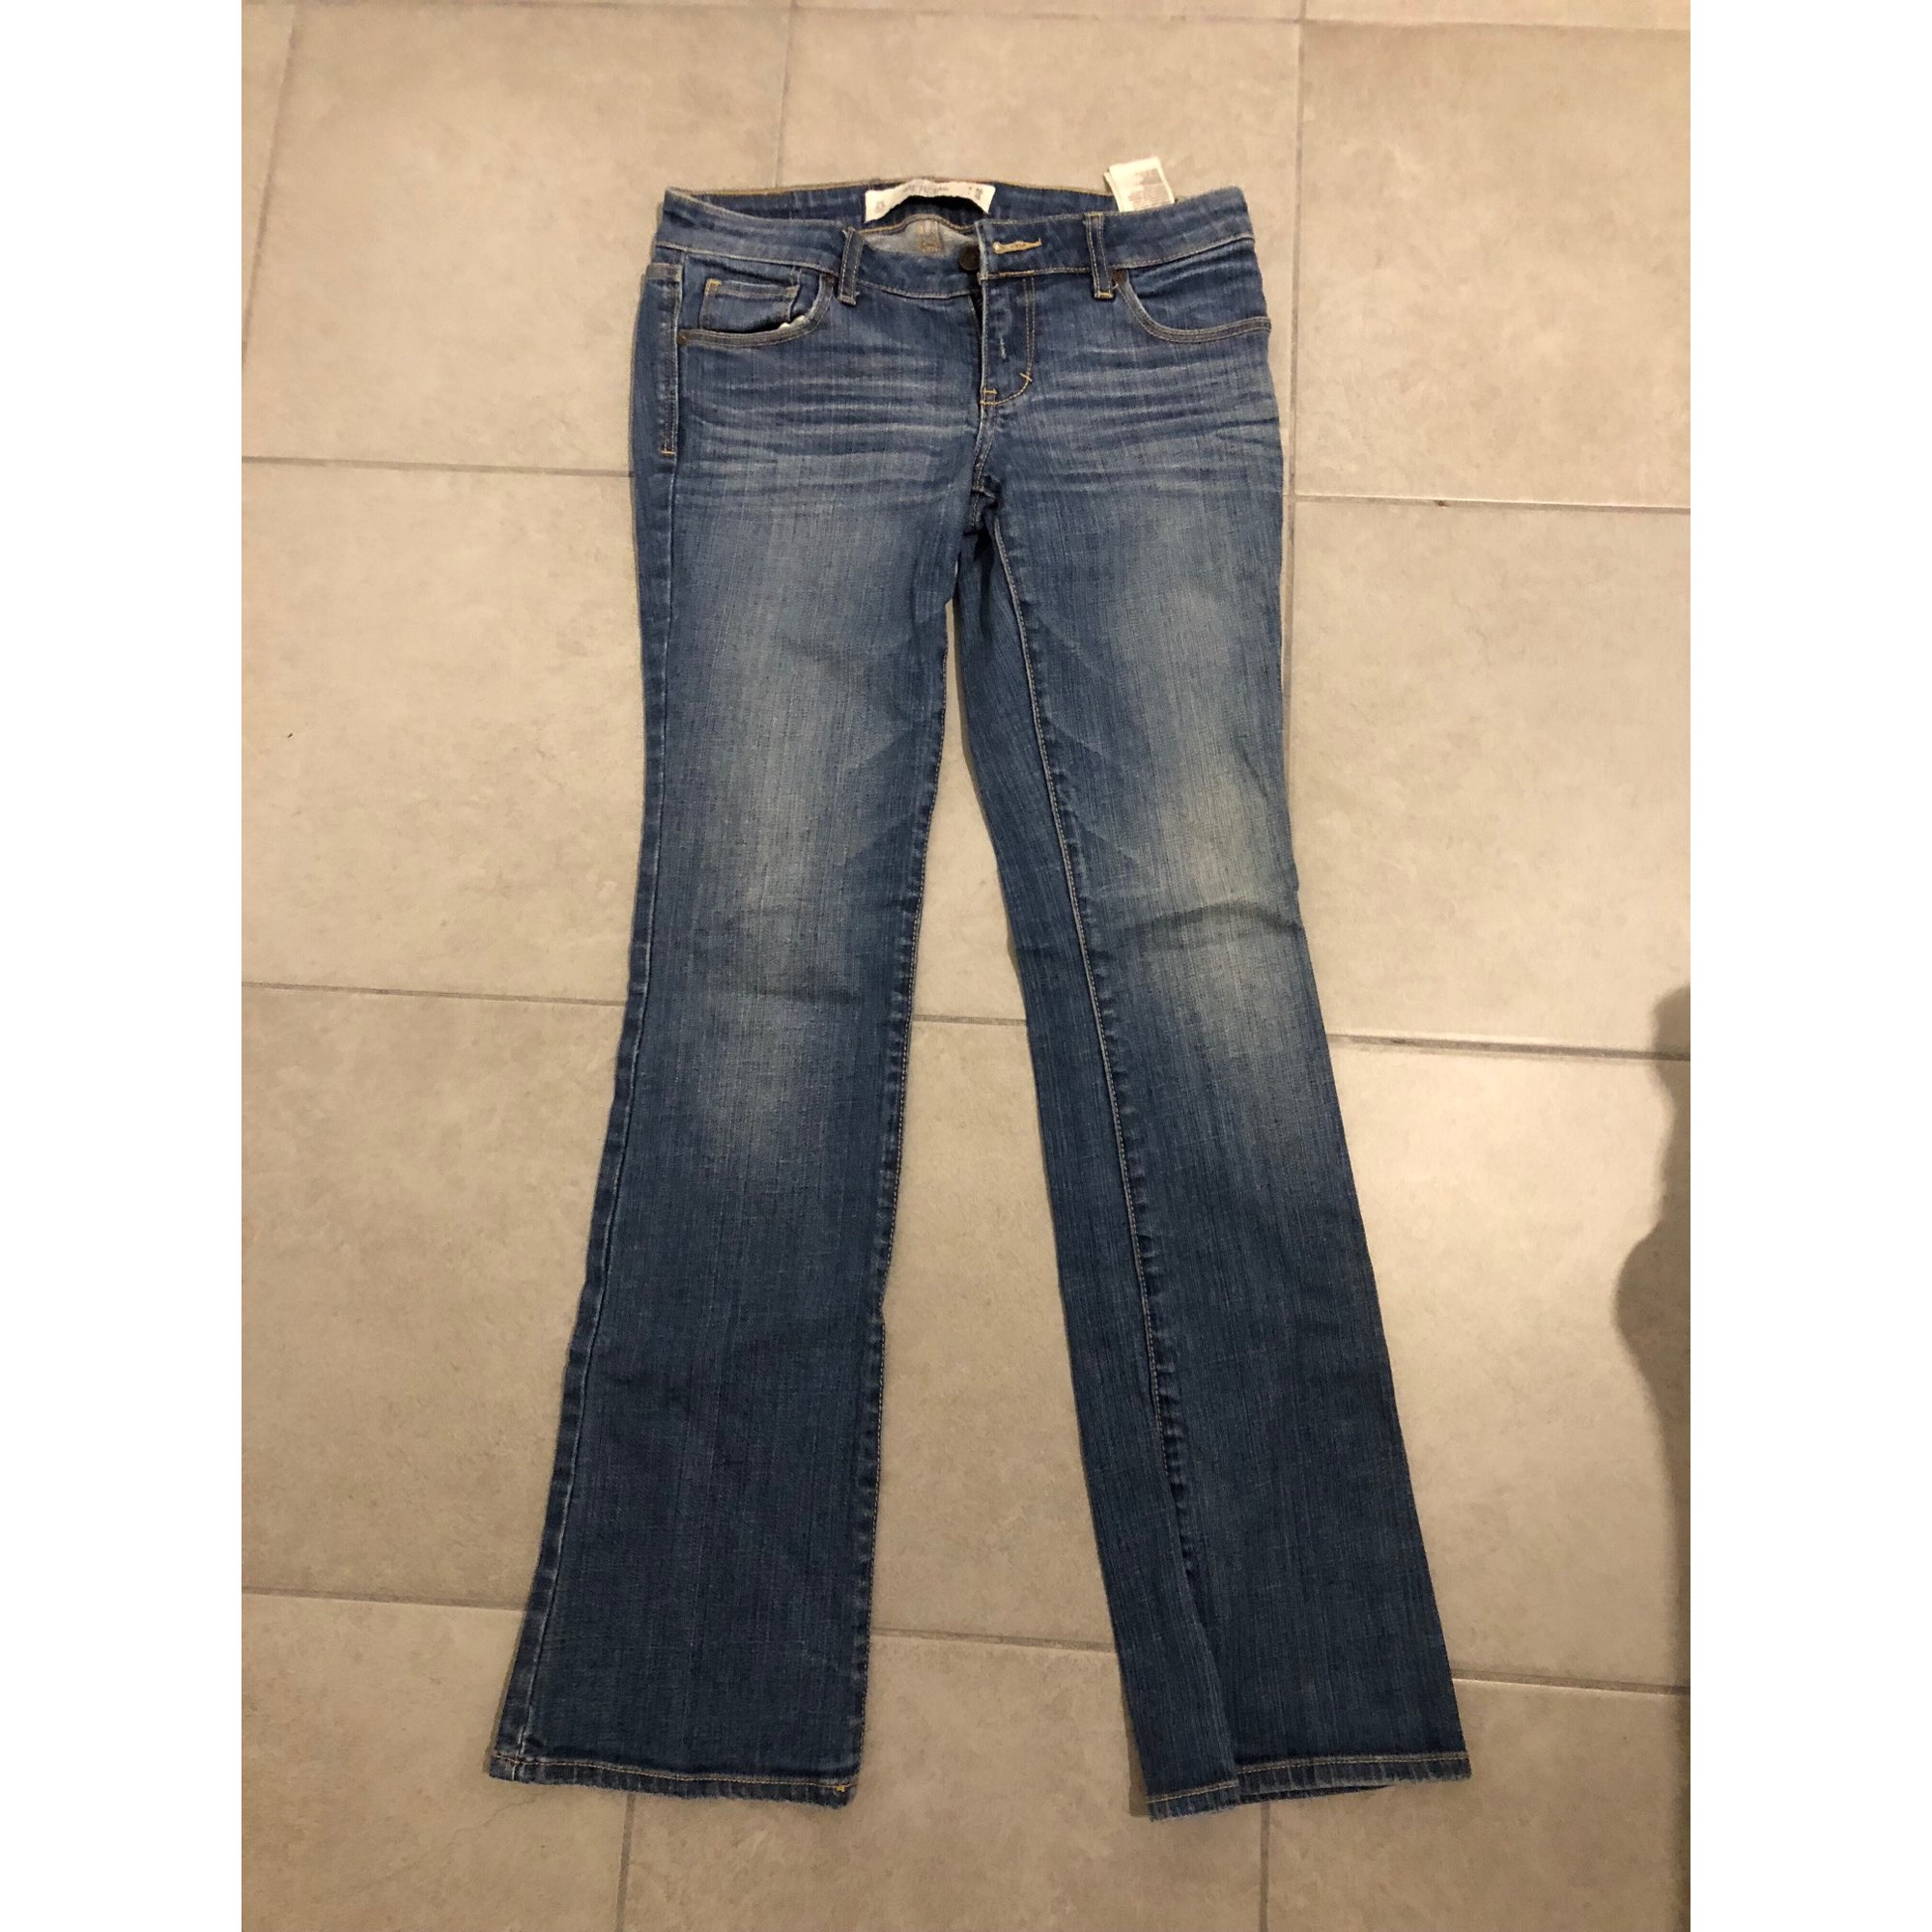 Pantalon droit ABERCROMBIE & FITCH Bleu, bleu marine, bleu turquoise